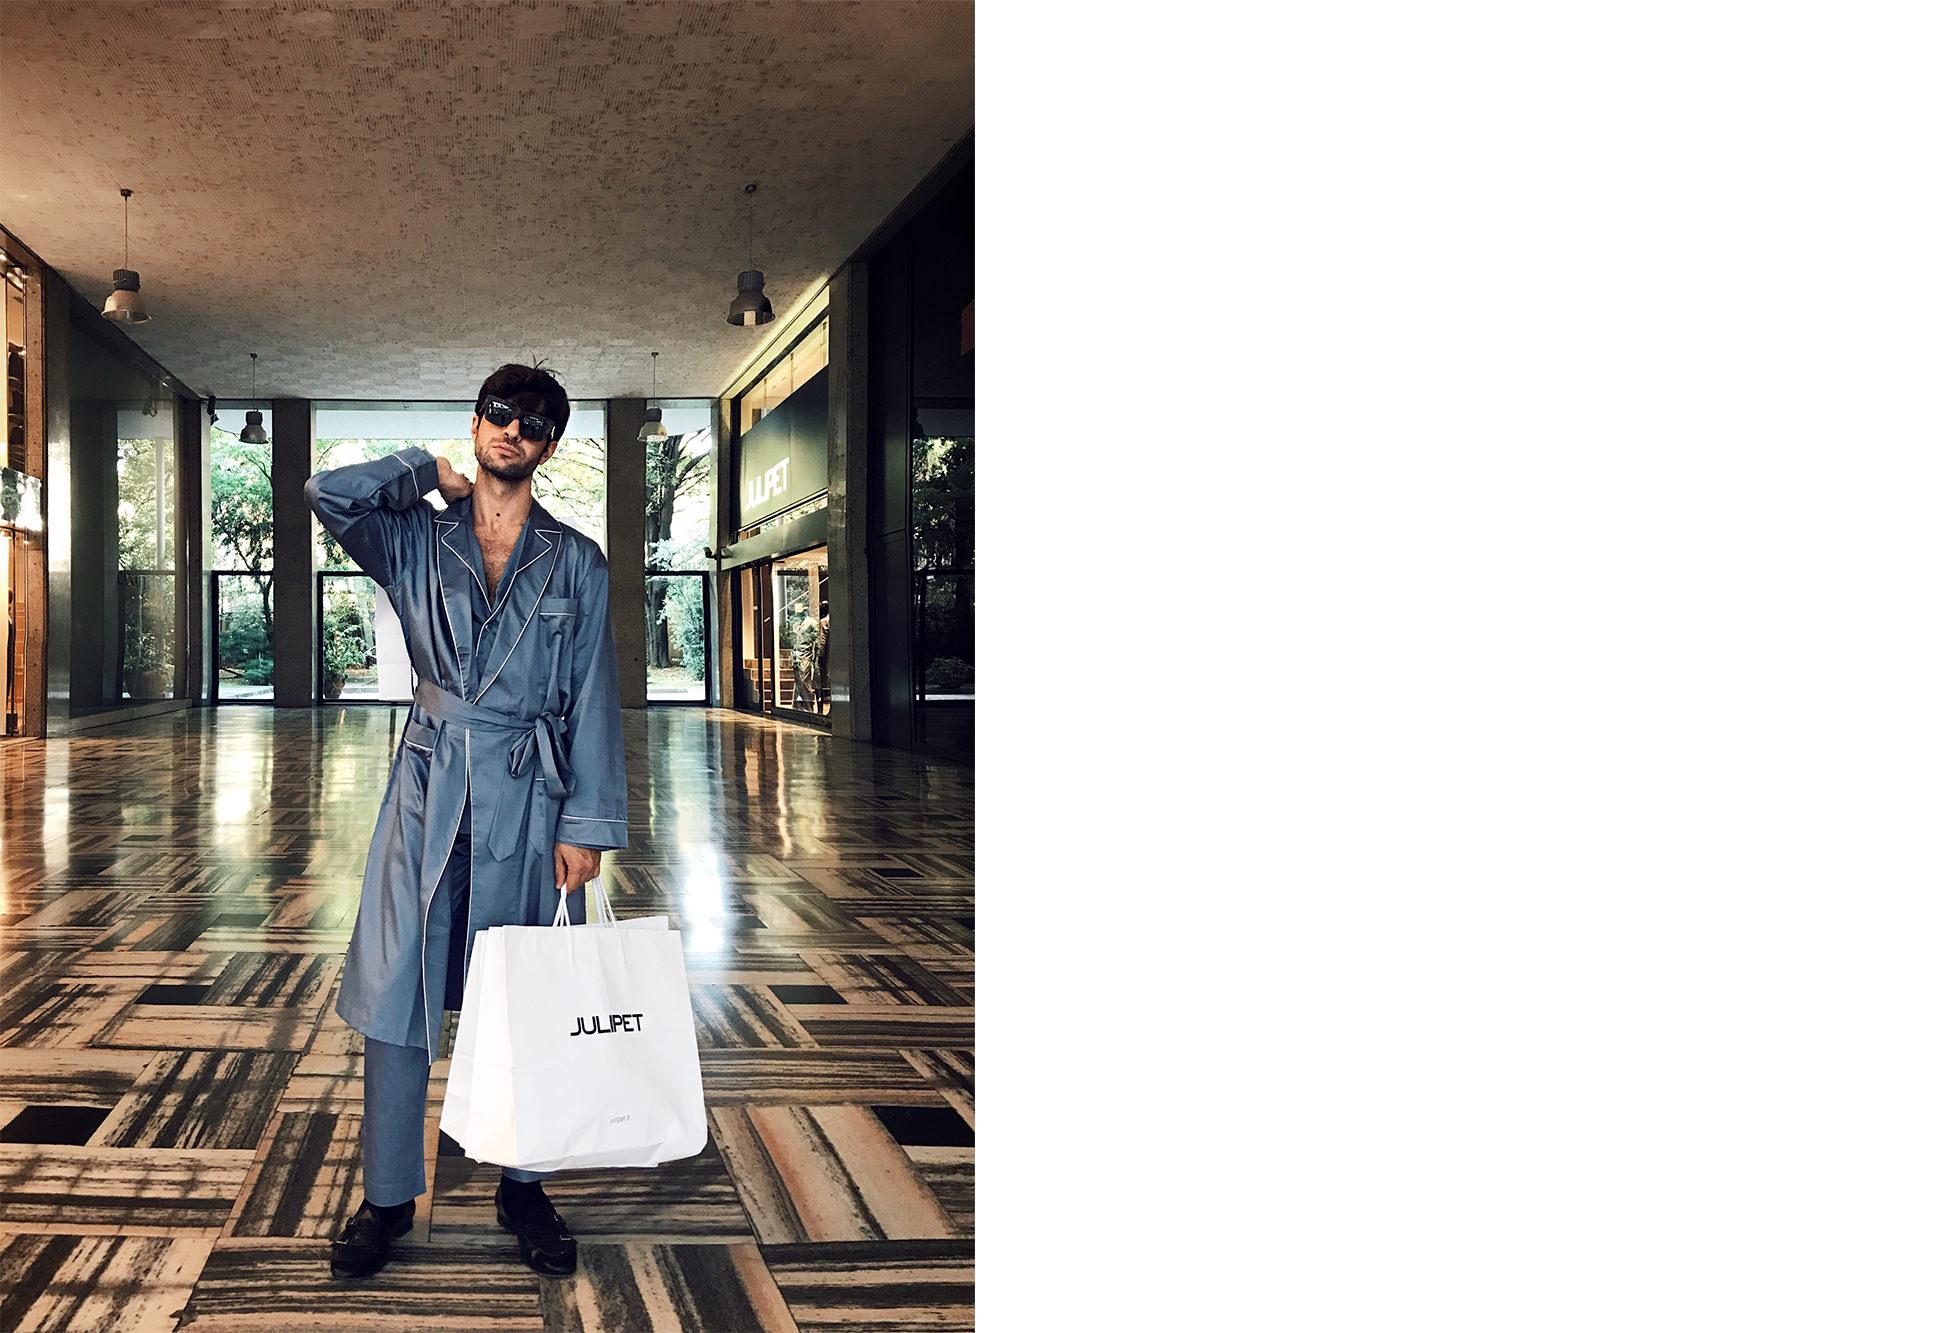 Julipet - intimo, loungewear e beachwear dedicato all'uomo